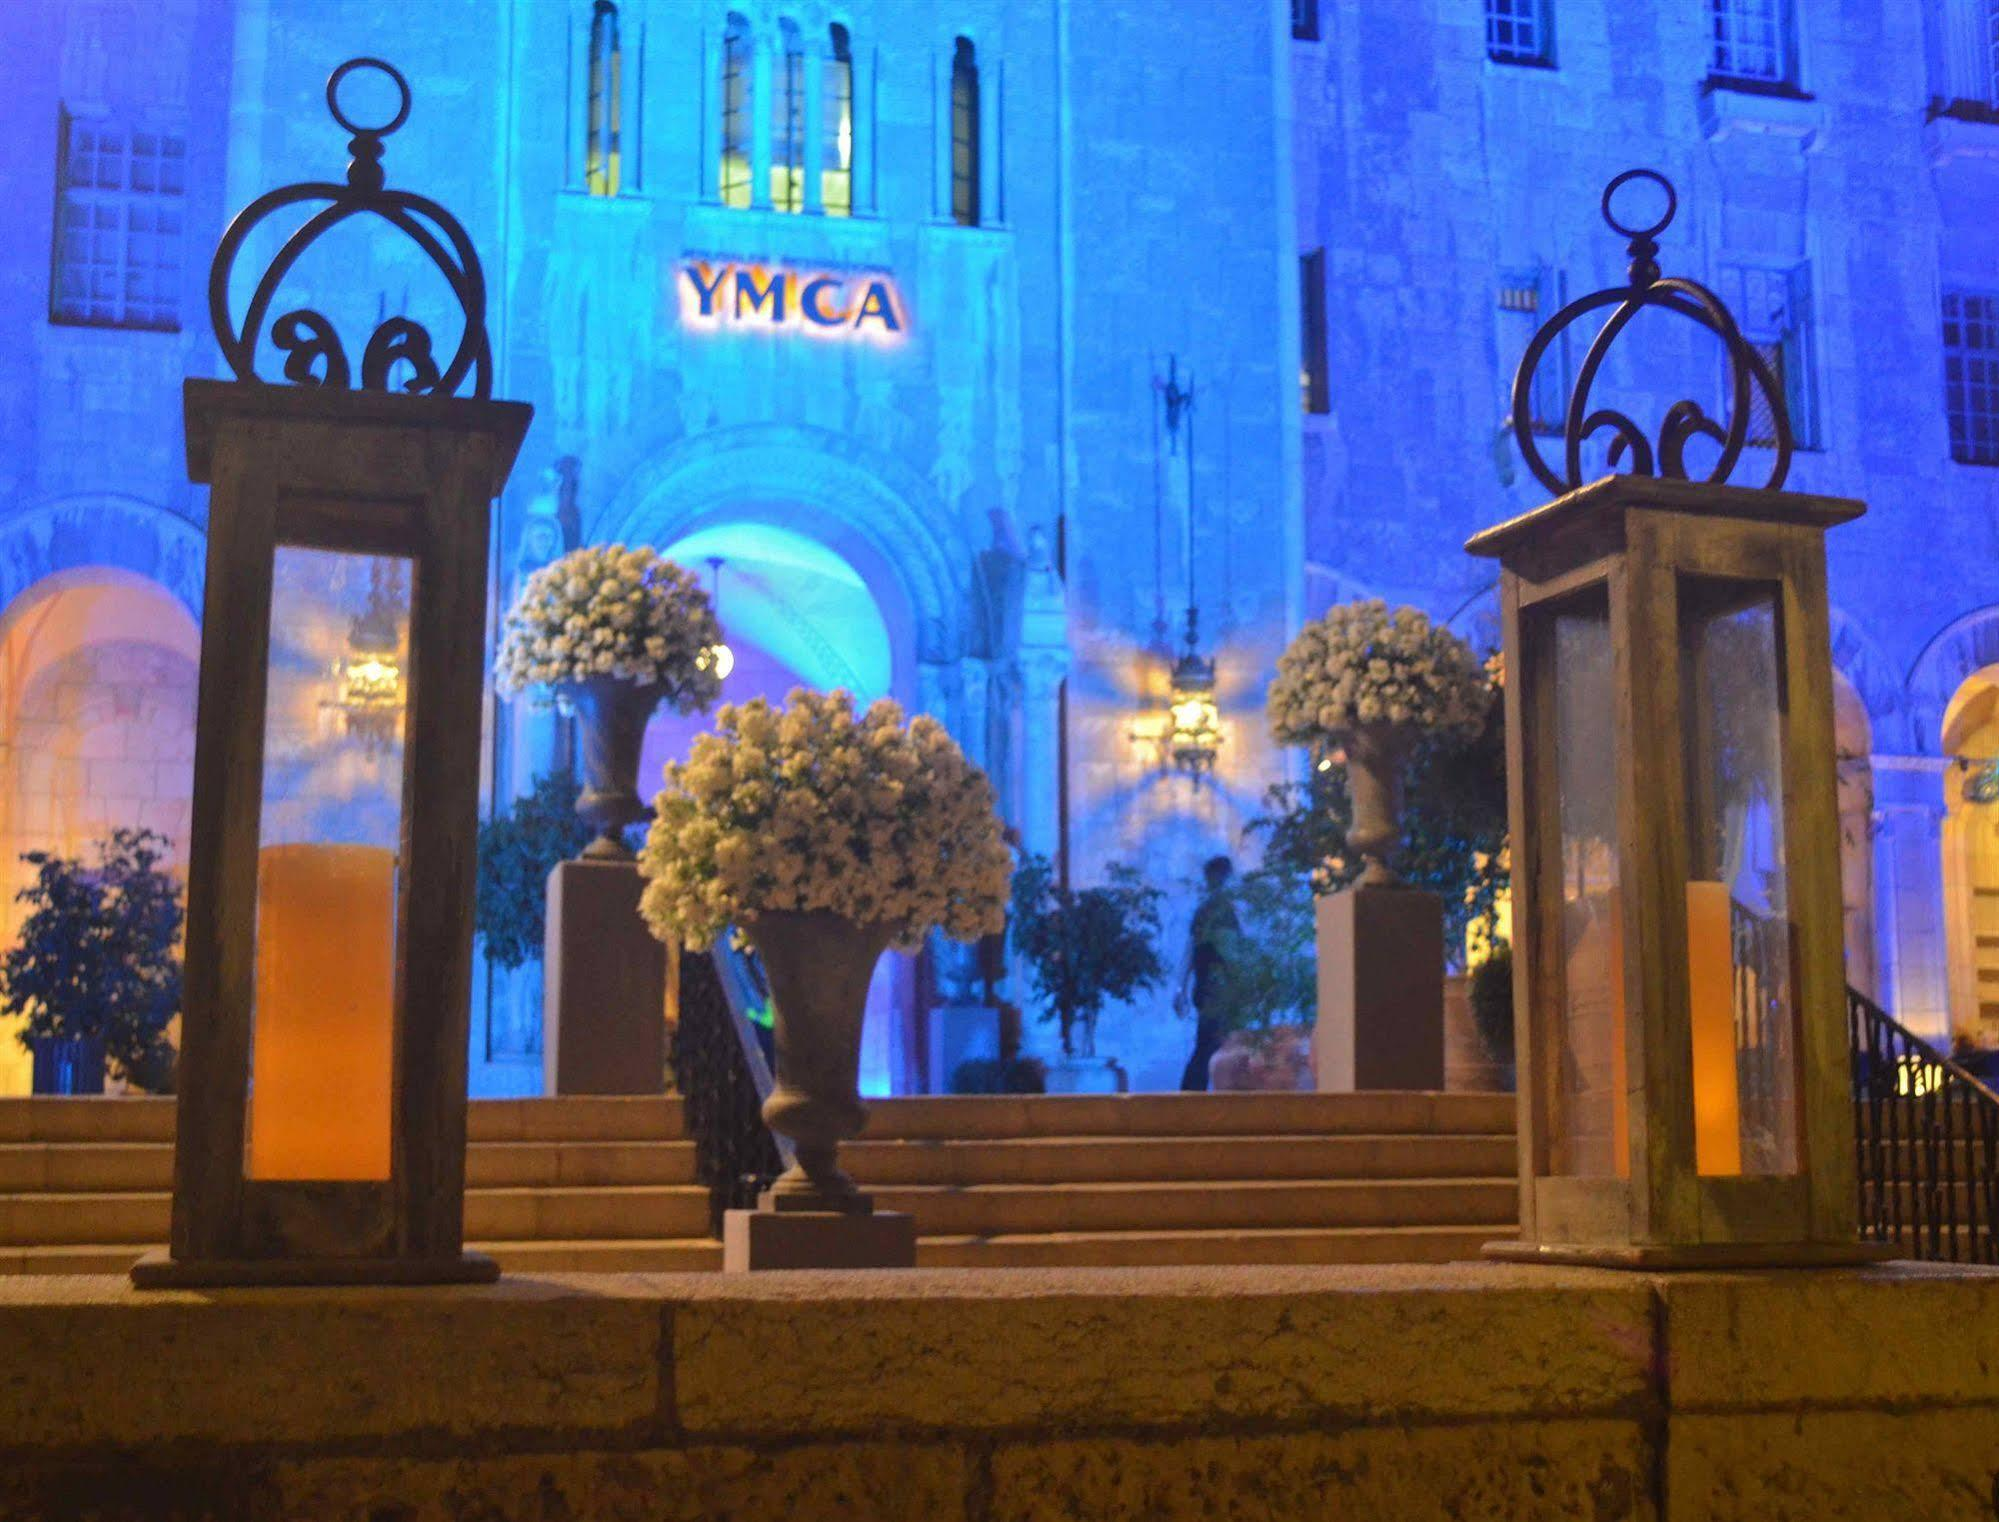 Ymca Three Arches Hotel, Jerusalem Image 3